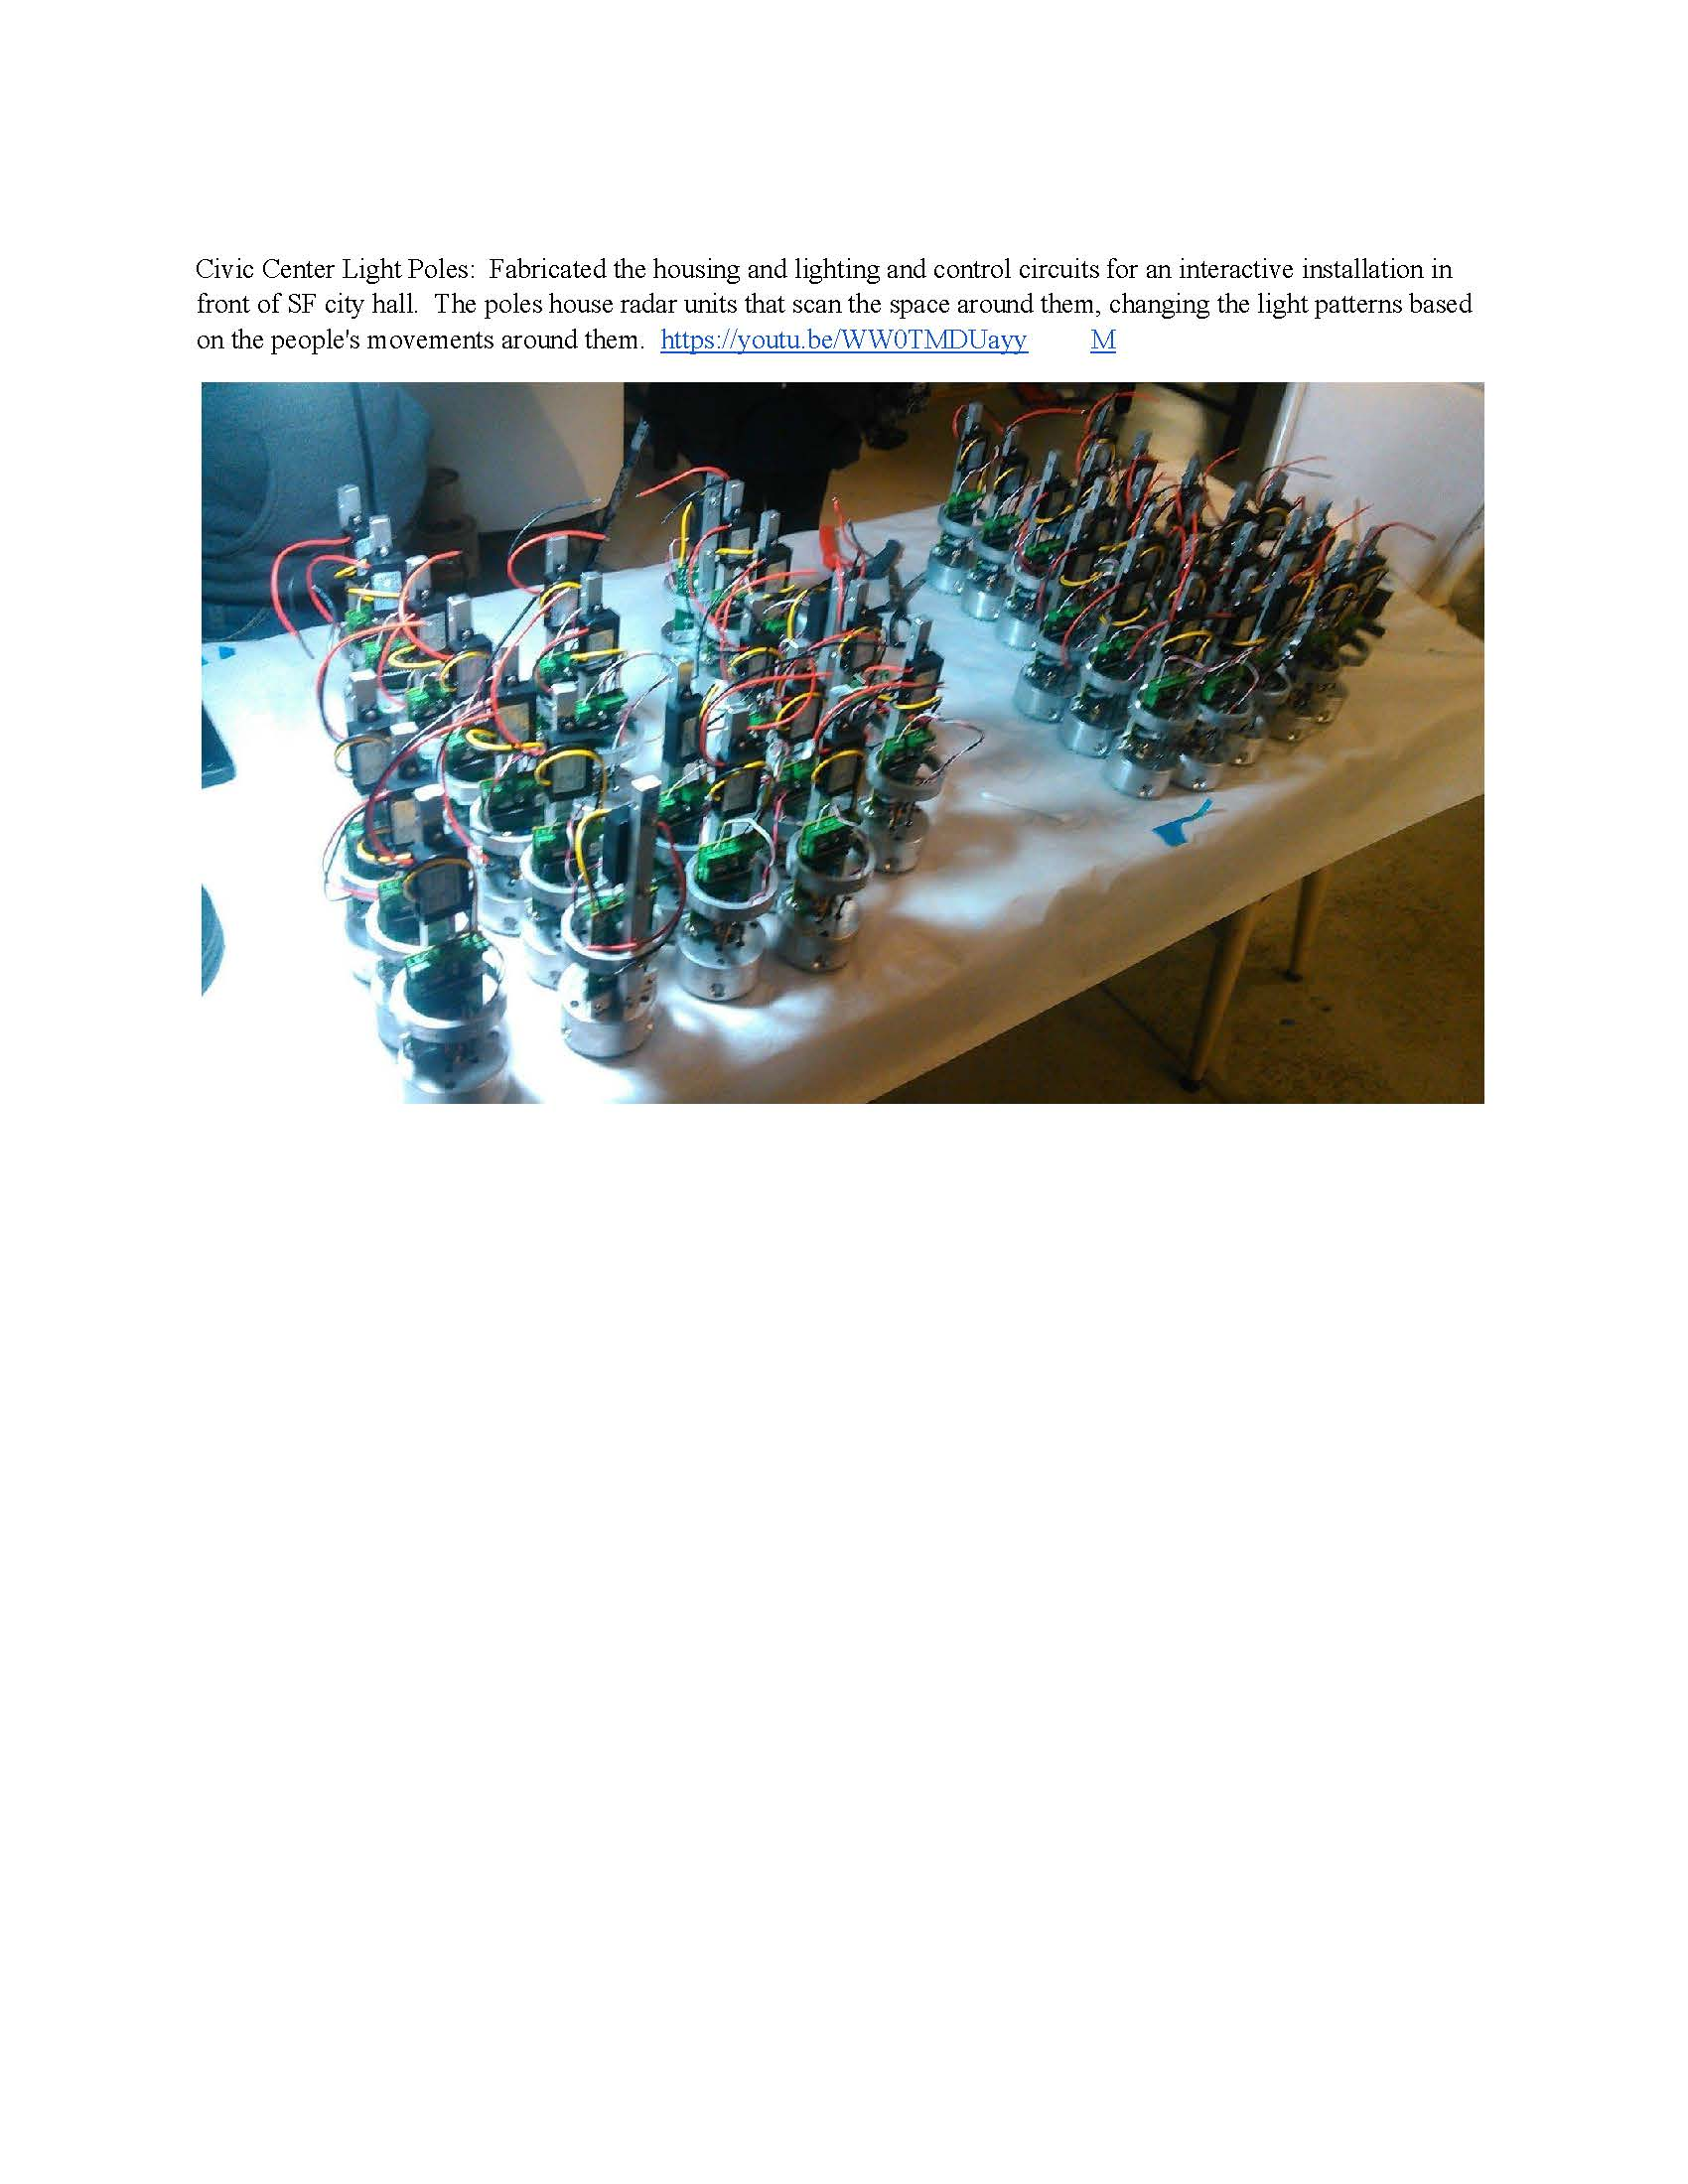 randys porfolio for slideshow_Page_10.jpg